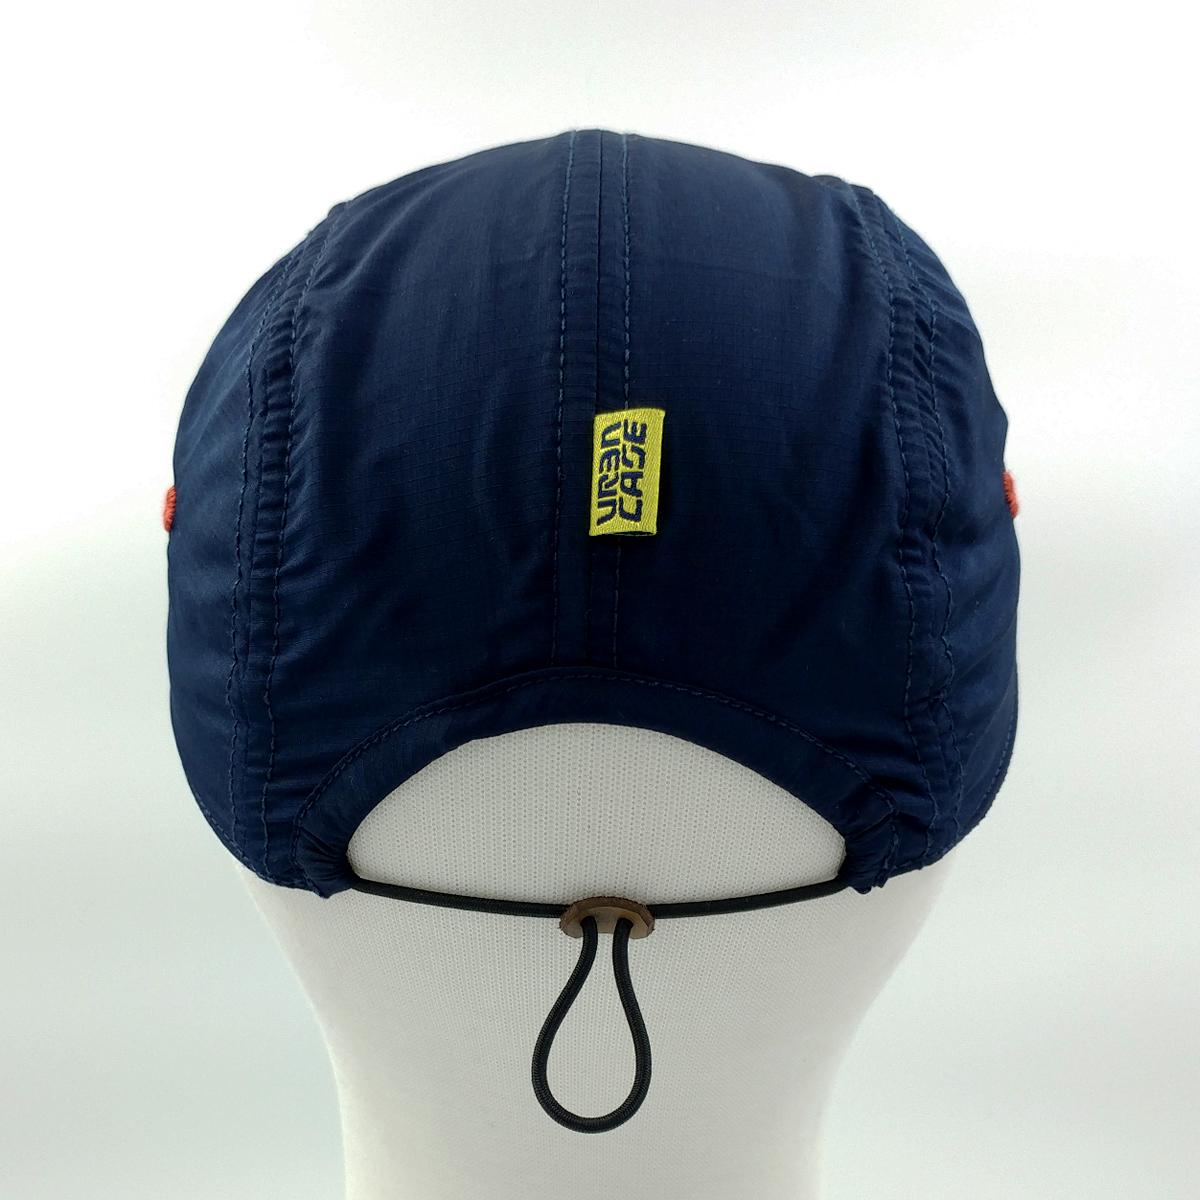 topi sepeda - bluegraven3